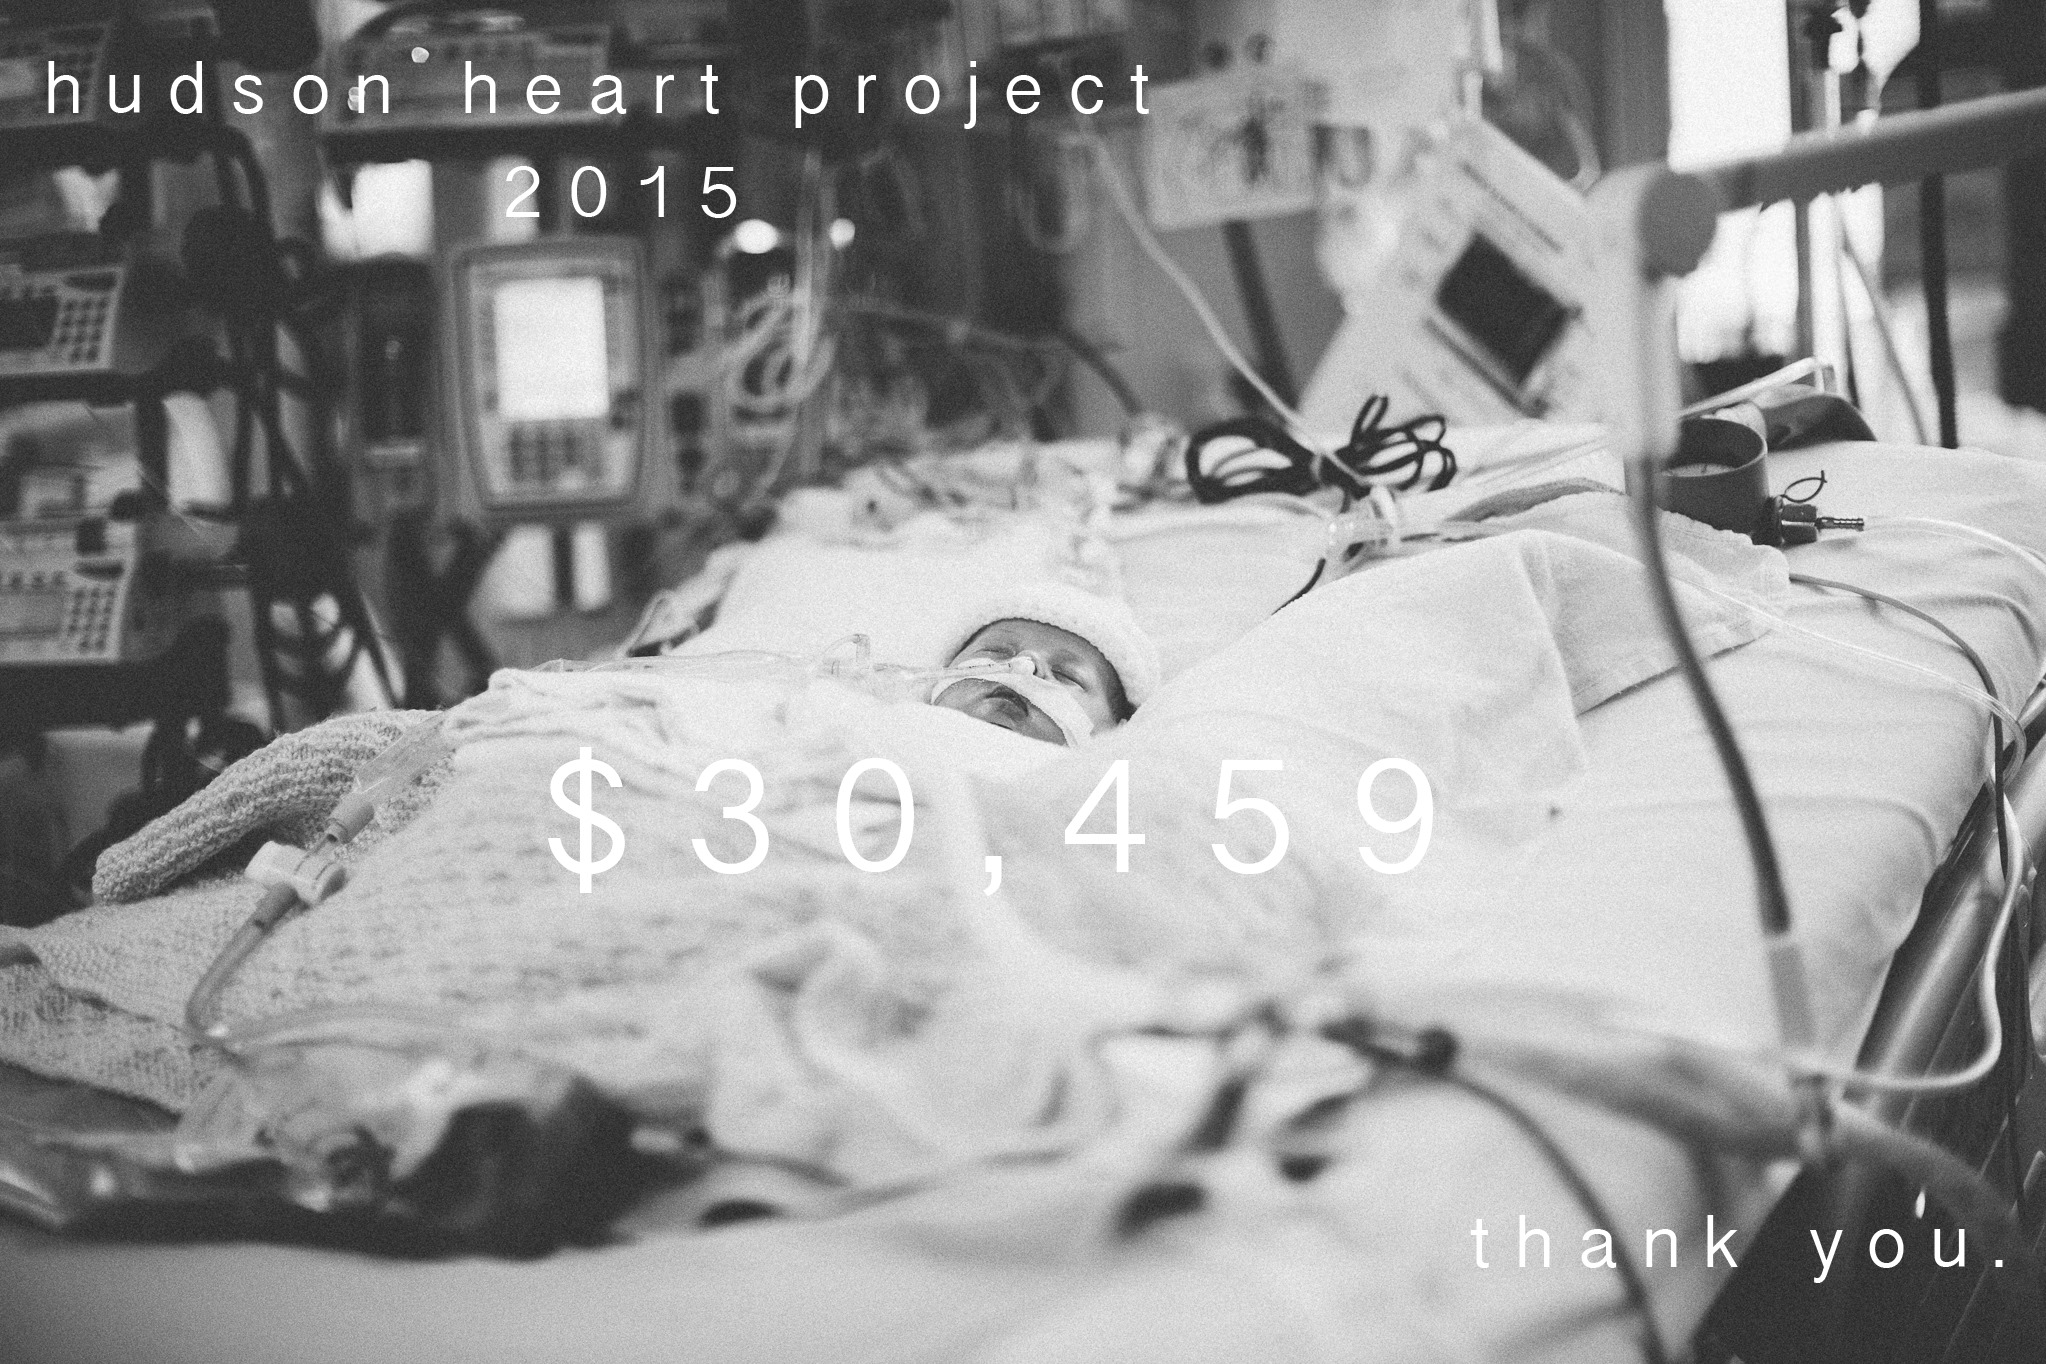 hudsonheartproject.jpg